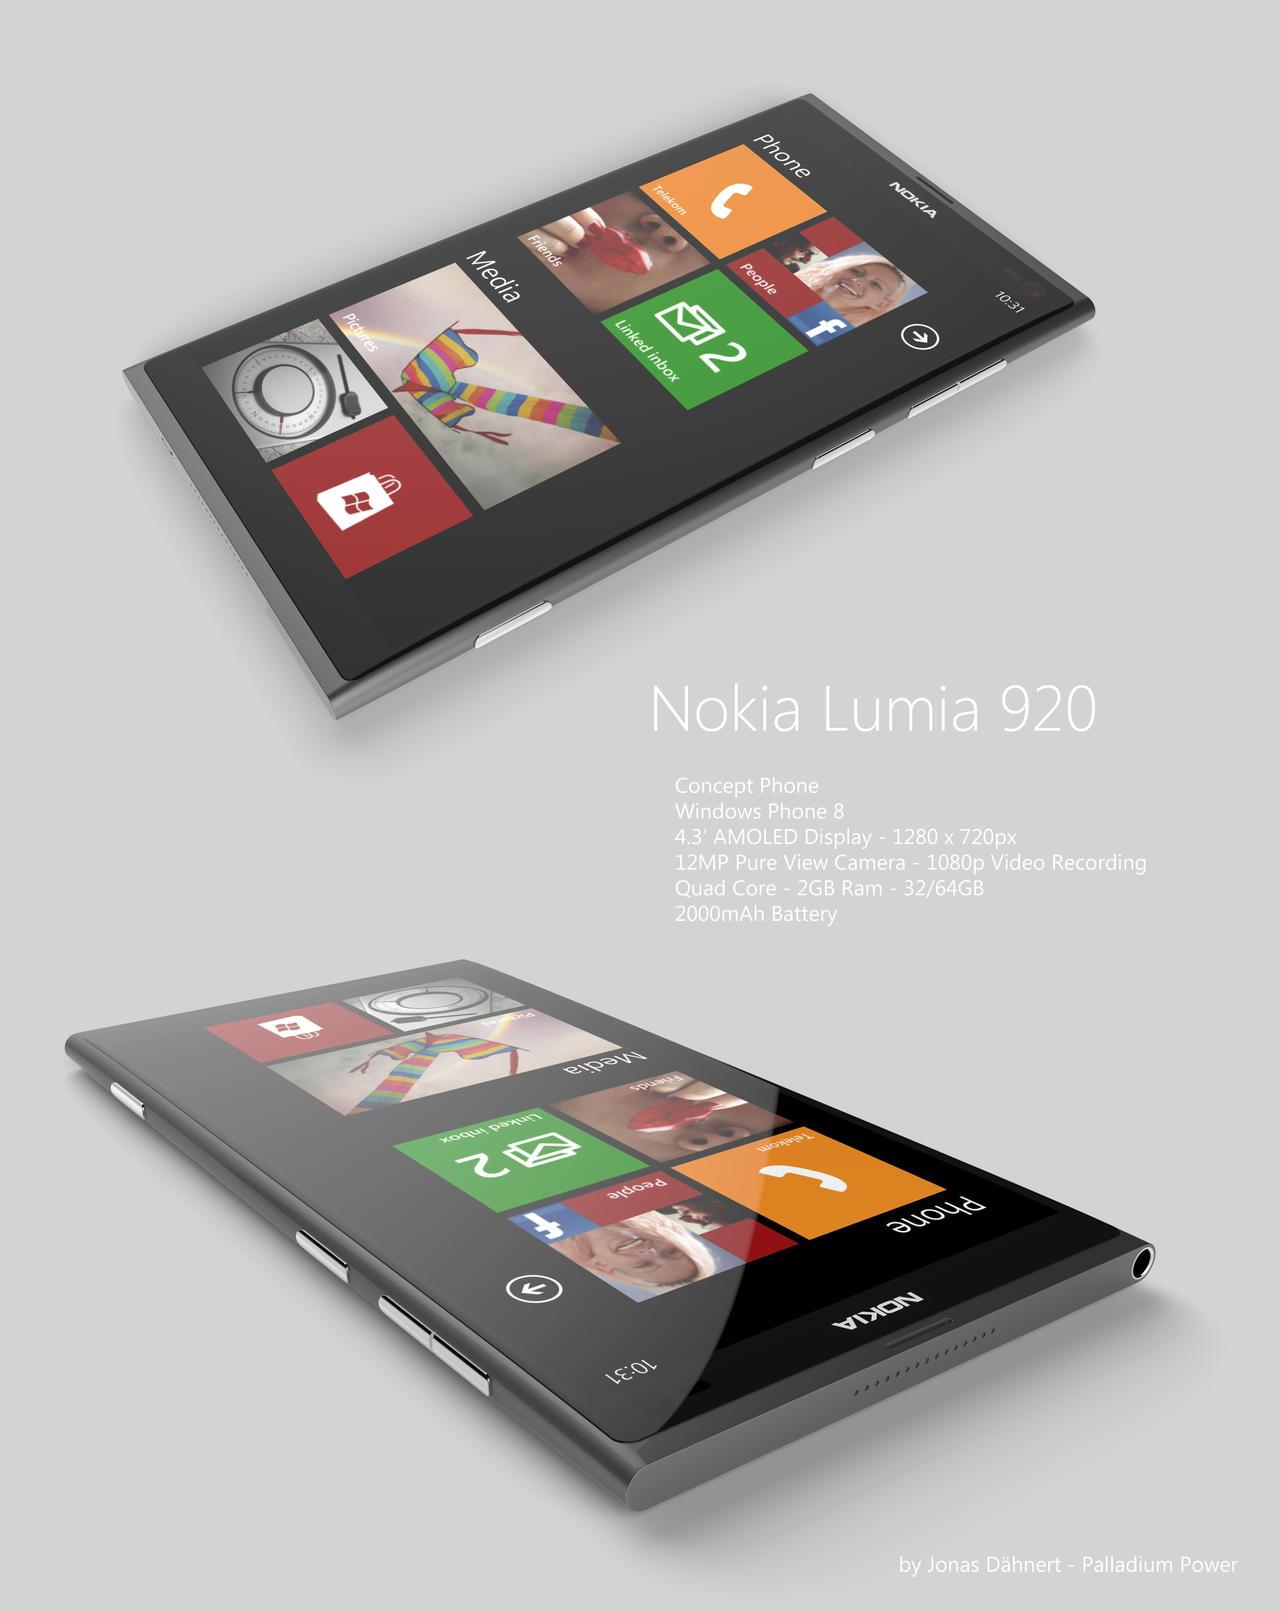 Nokia Lumia 920 Windows Phone 8